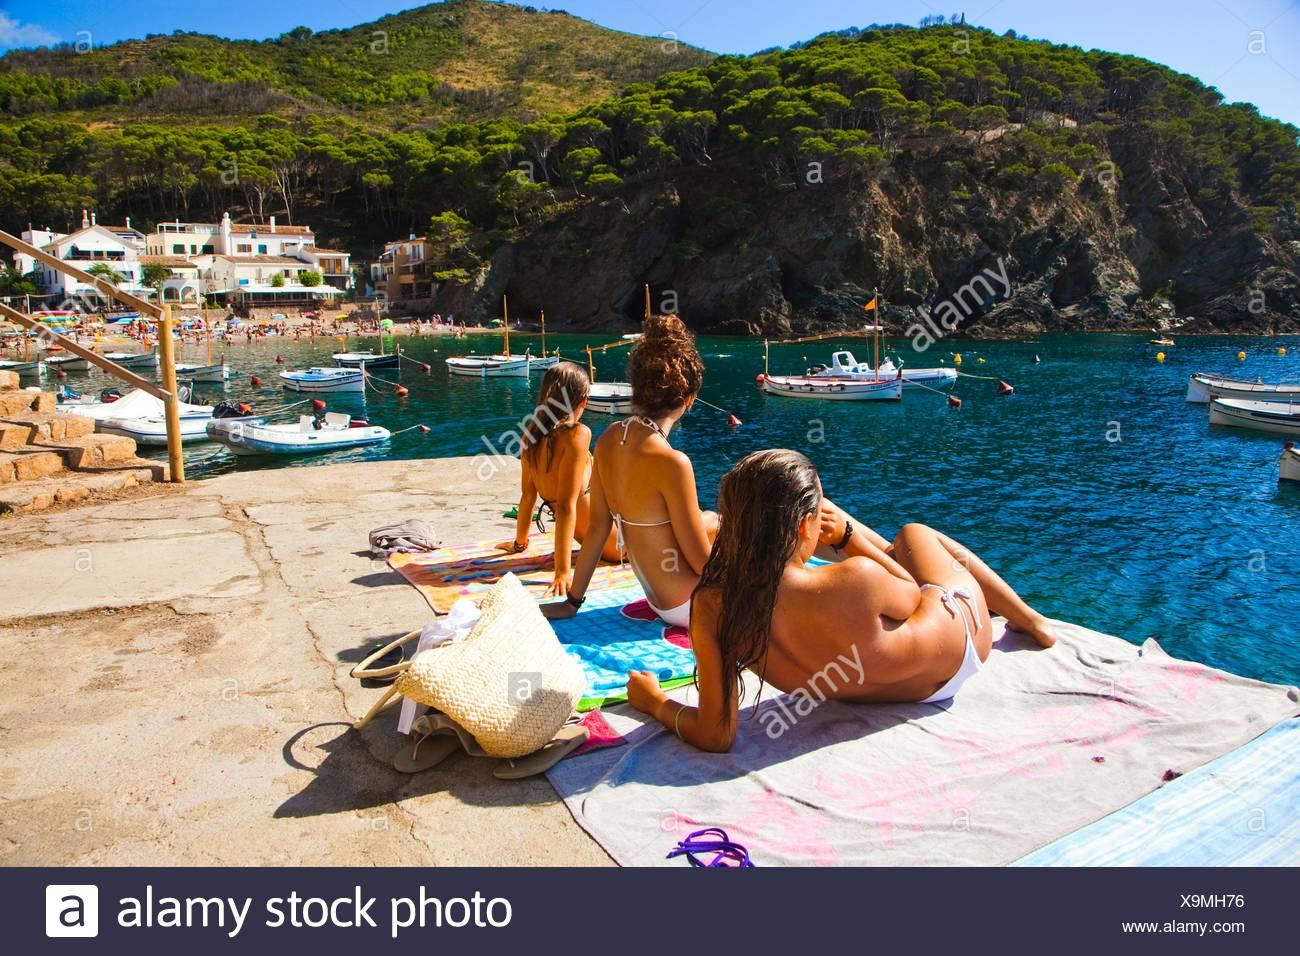 Sa Tuna Beach, Begur, Baix Empordá, Costa Brava, Girona Province, Catalonia, Spain. - Stock Image